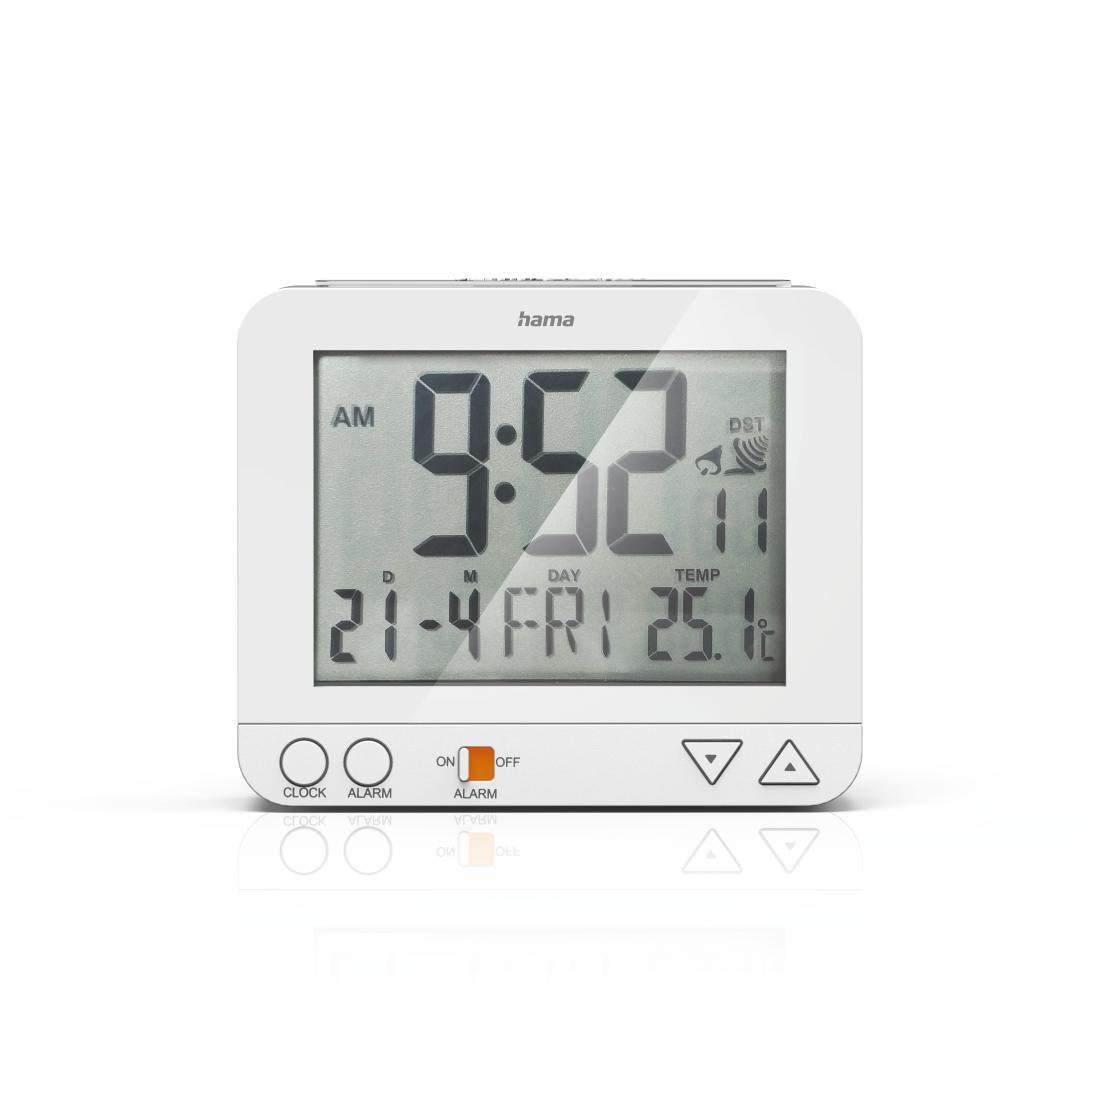 Hama Réveil radiopiloté RC 550 avec fonction veilleuse blanc